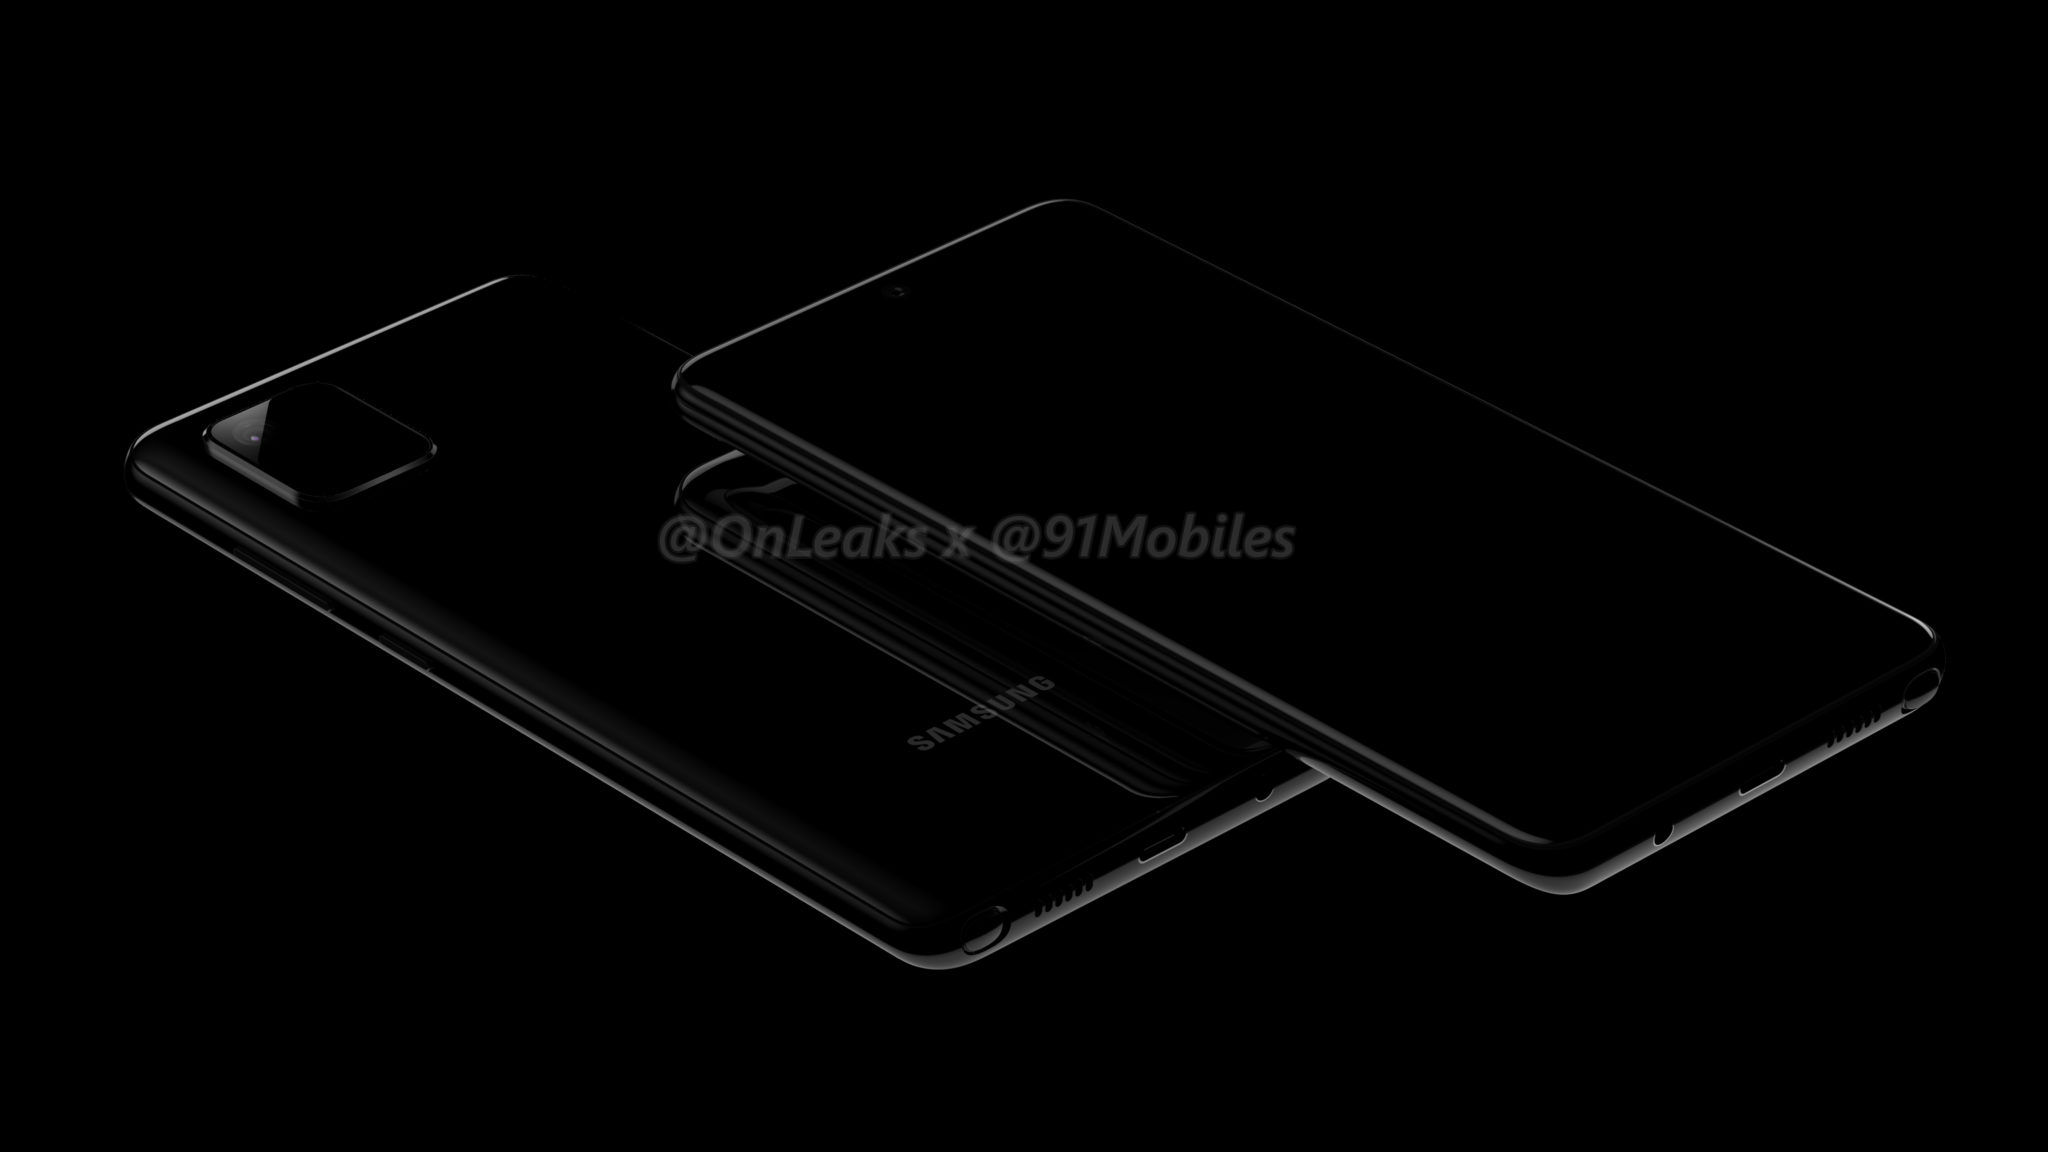 smartfon Samsung Galaxy Note 10 Lite / Galaxy A81 render